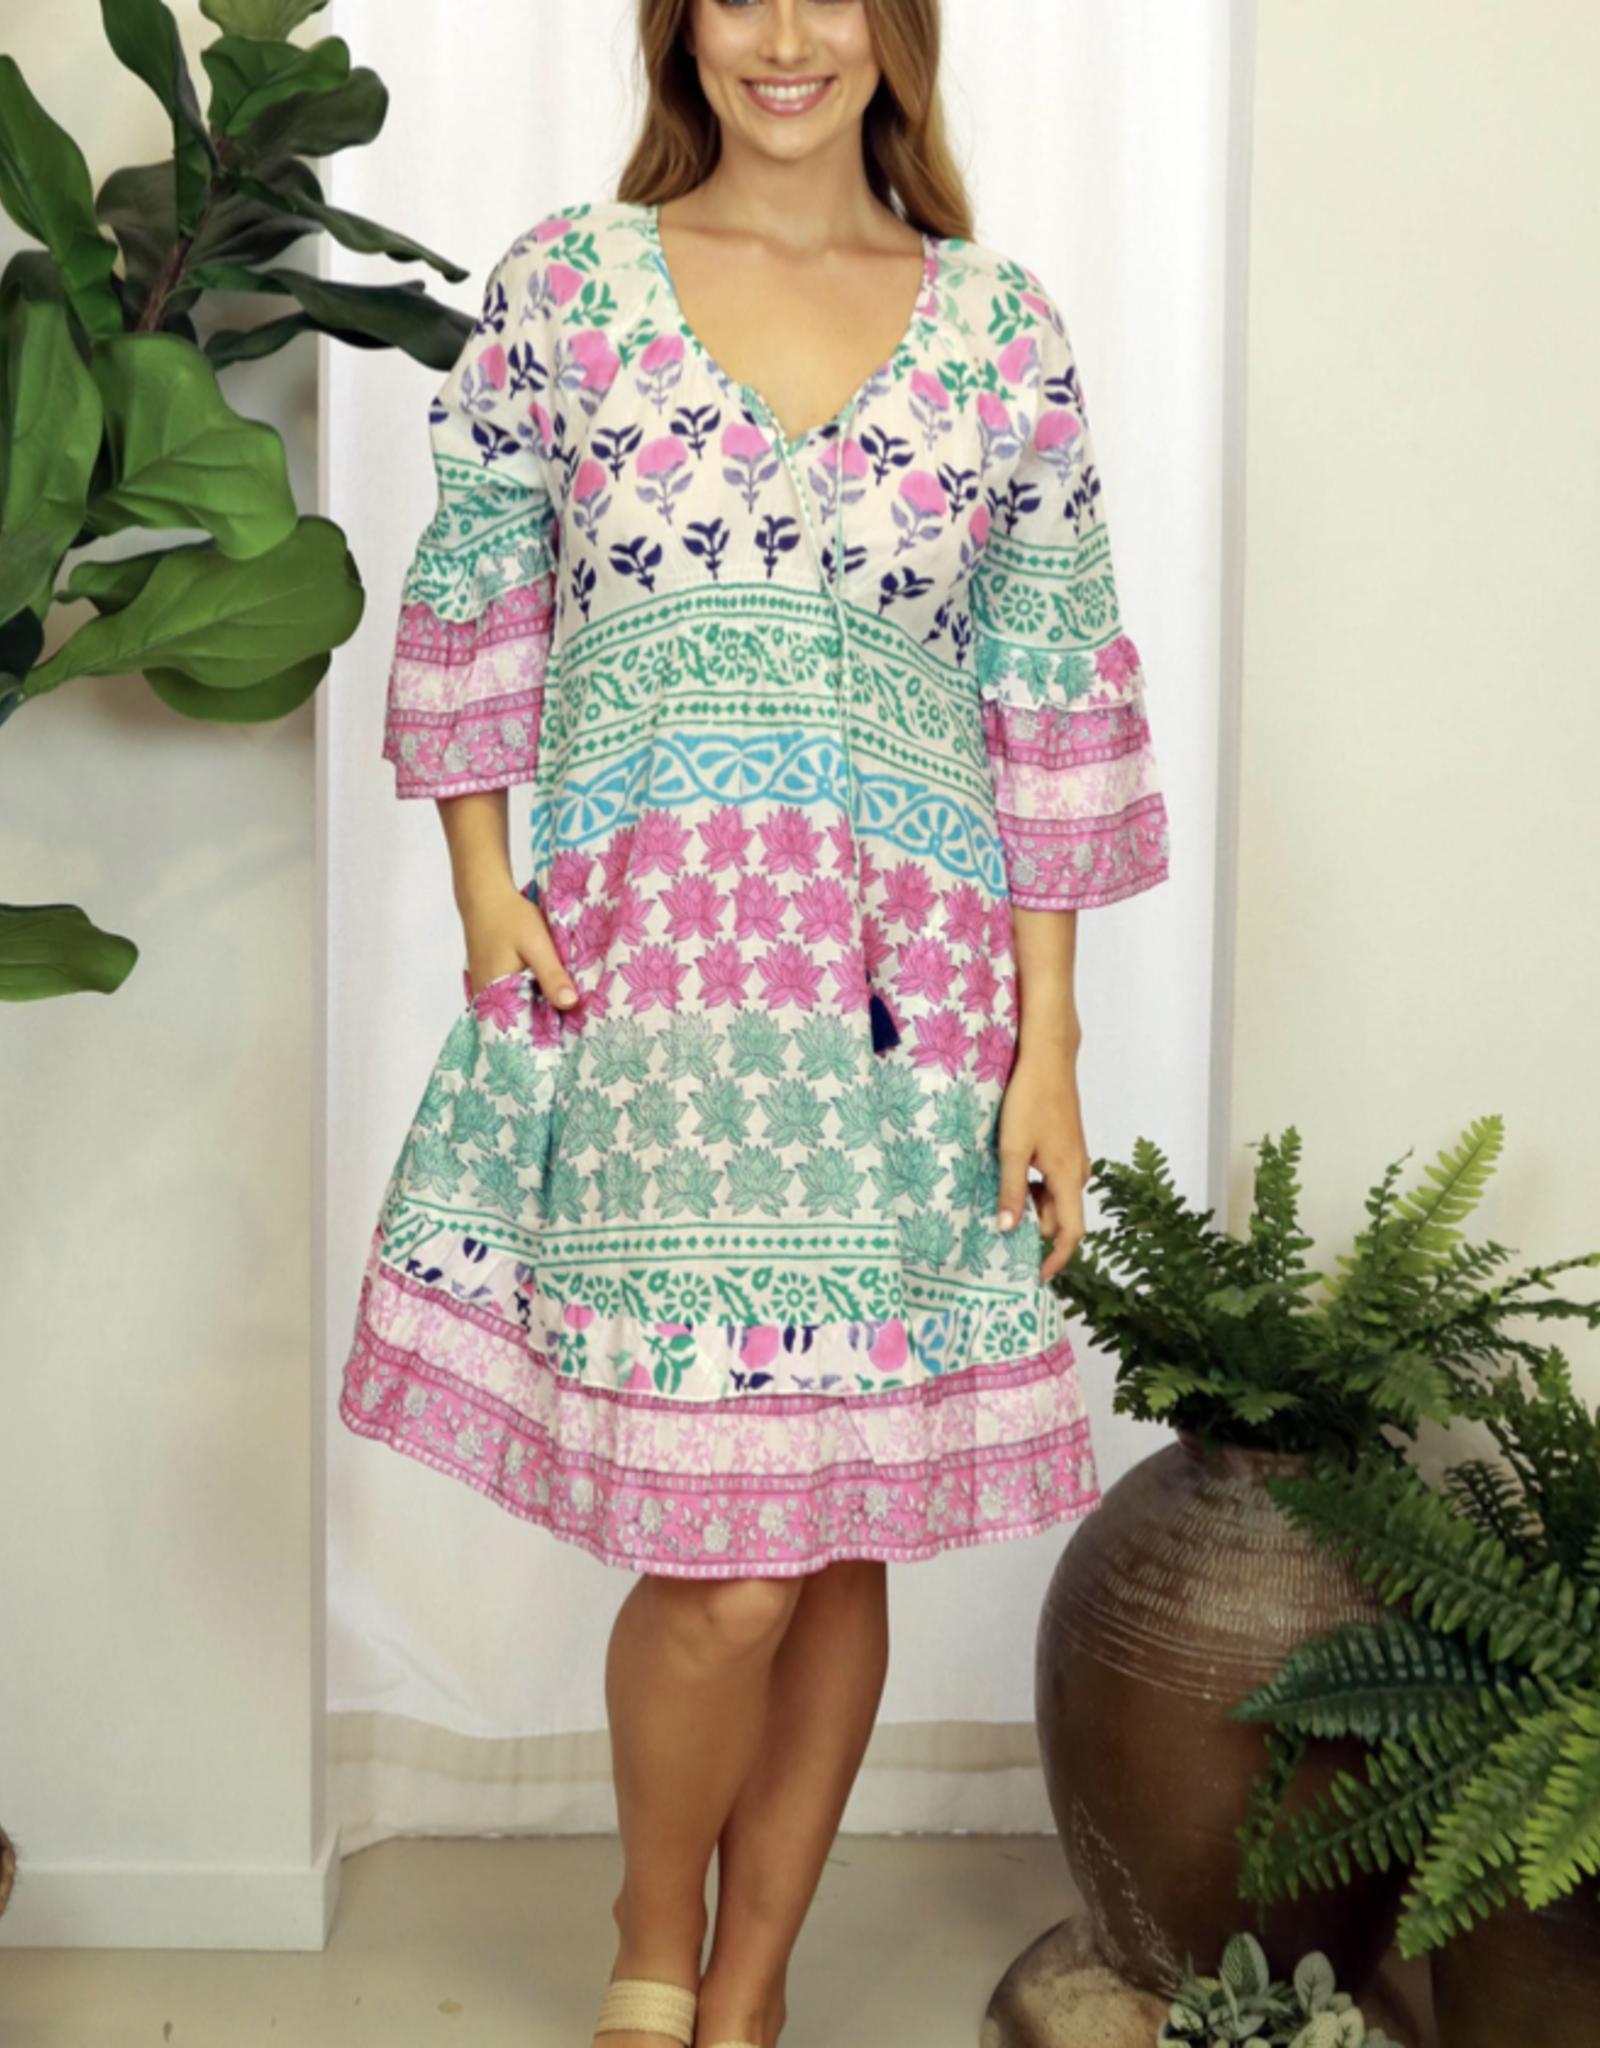 LULALIFE KAYDEN SHIRRED DRESS